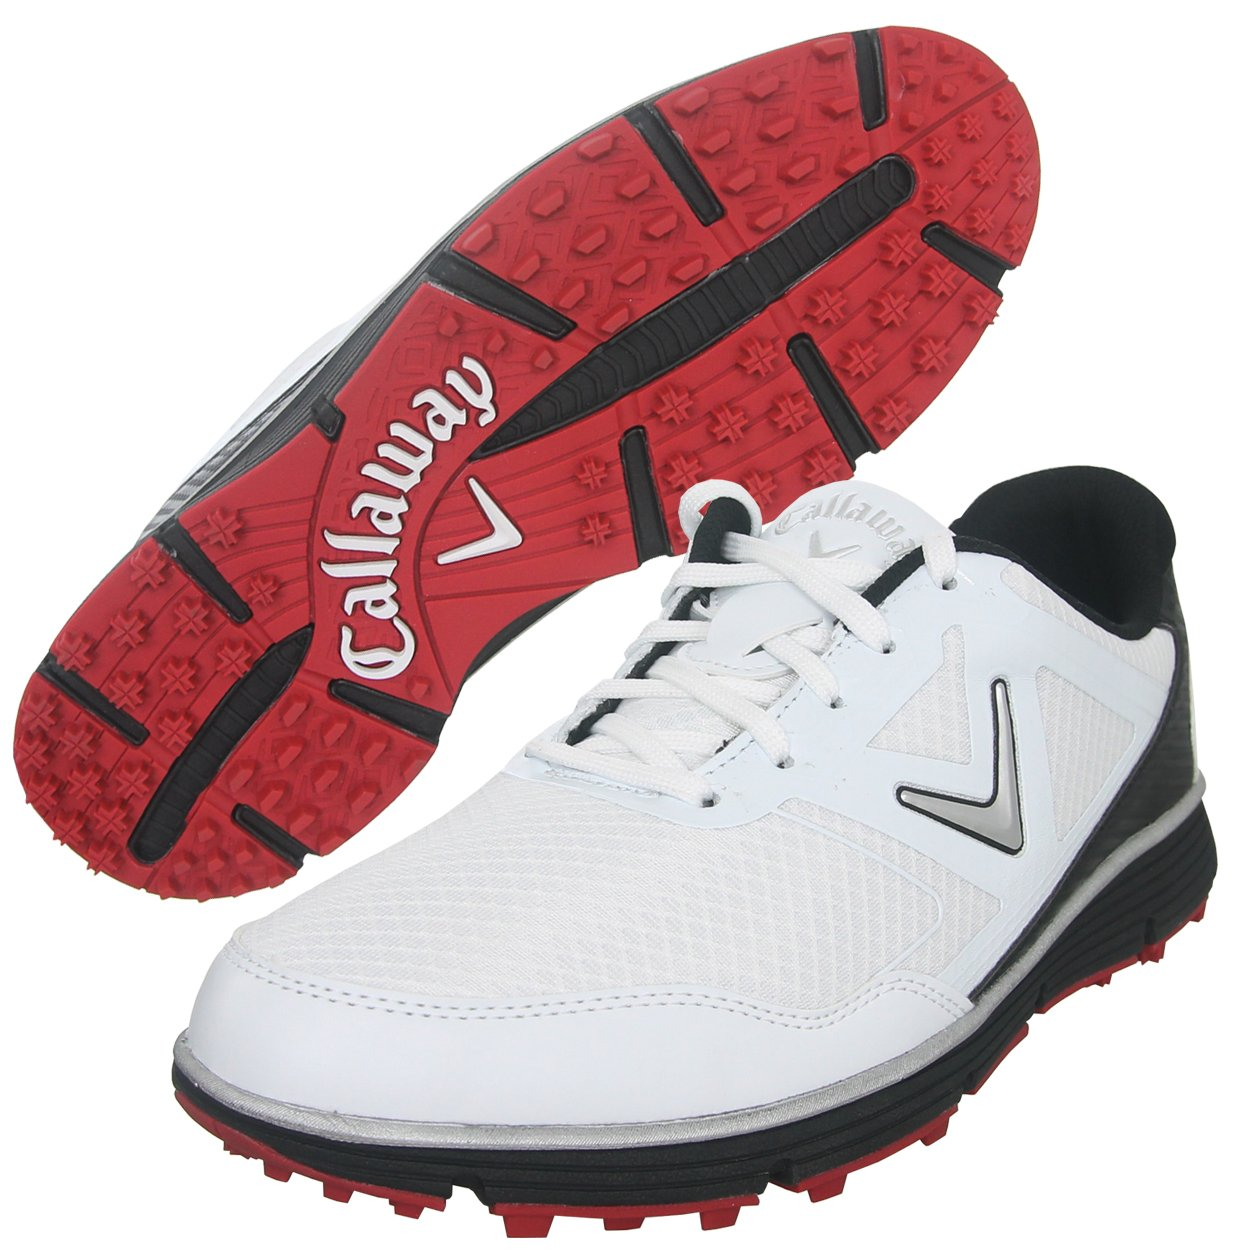 Callaway Men's Balboa Vent Golf Shoe, White/Black, 9 W US by Callaway (Image #3)